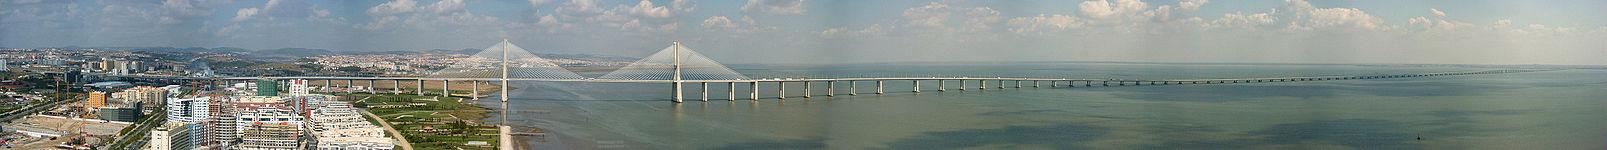 Vista da Ponte Vasco da Gama do topo da Torre Vasco da Gama.